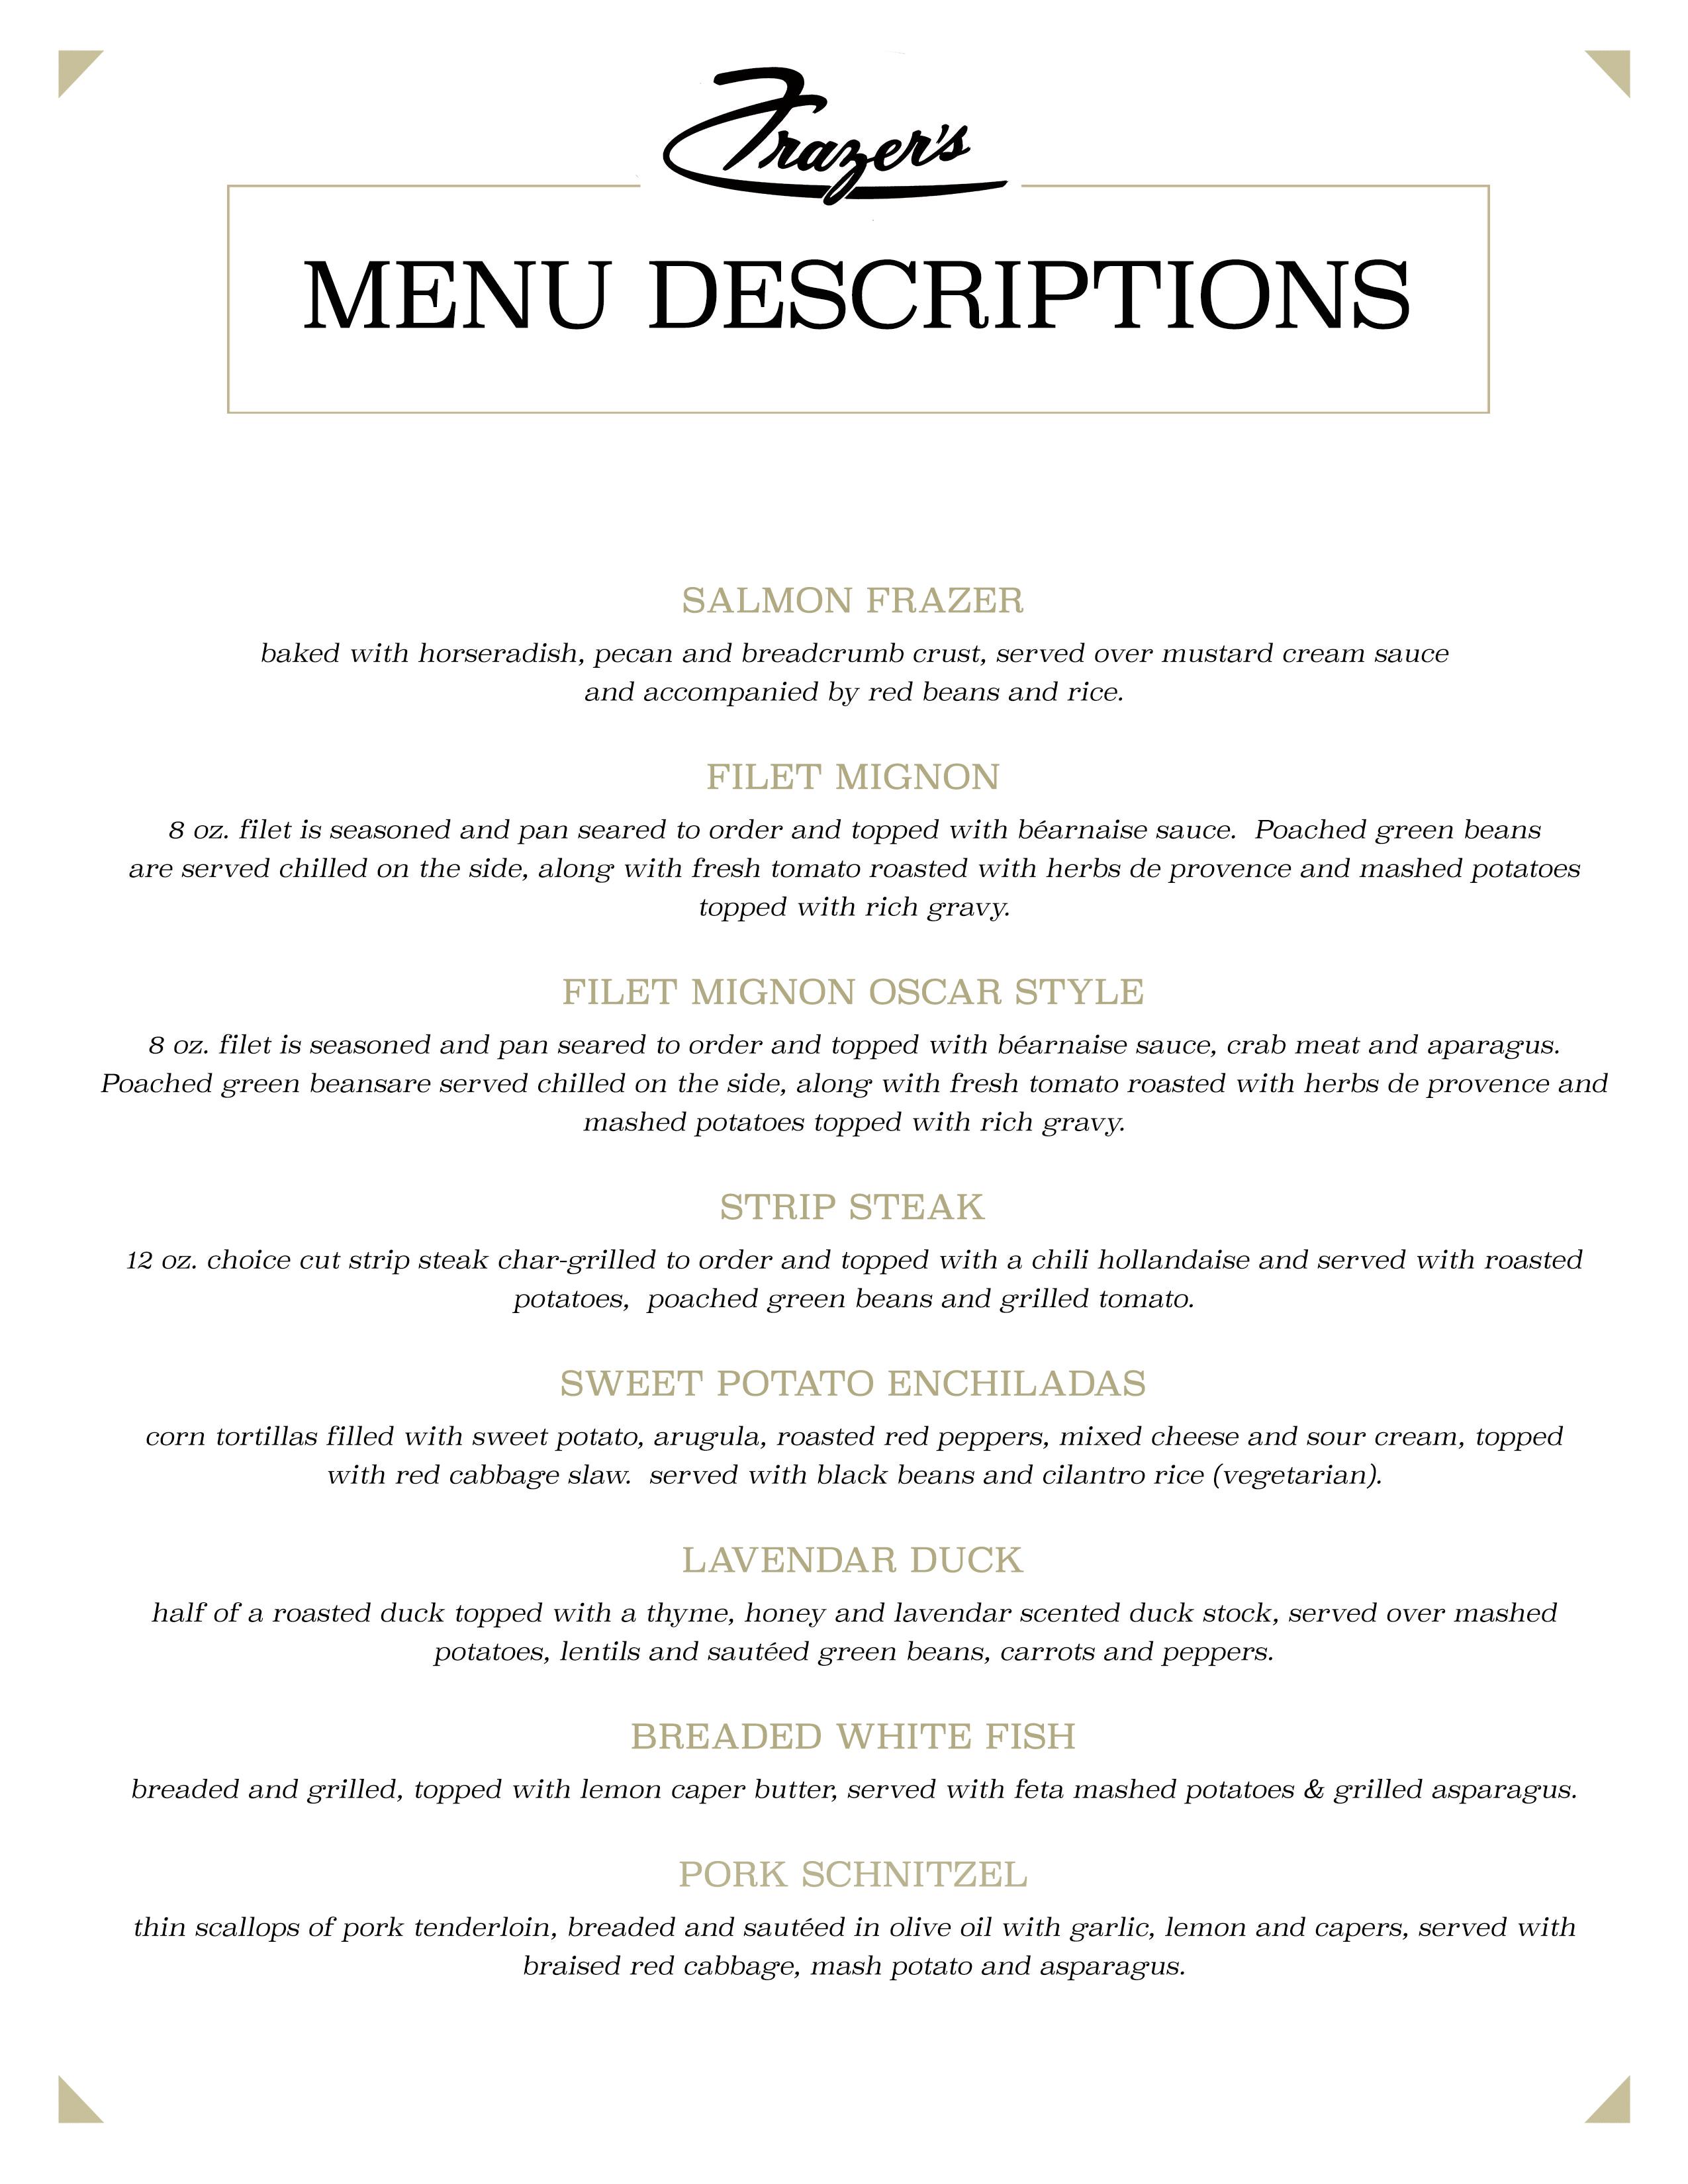 Menu Descriptions Frazer S Restaurant In Soulard